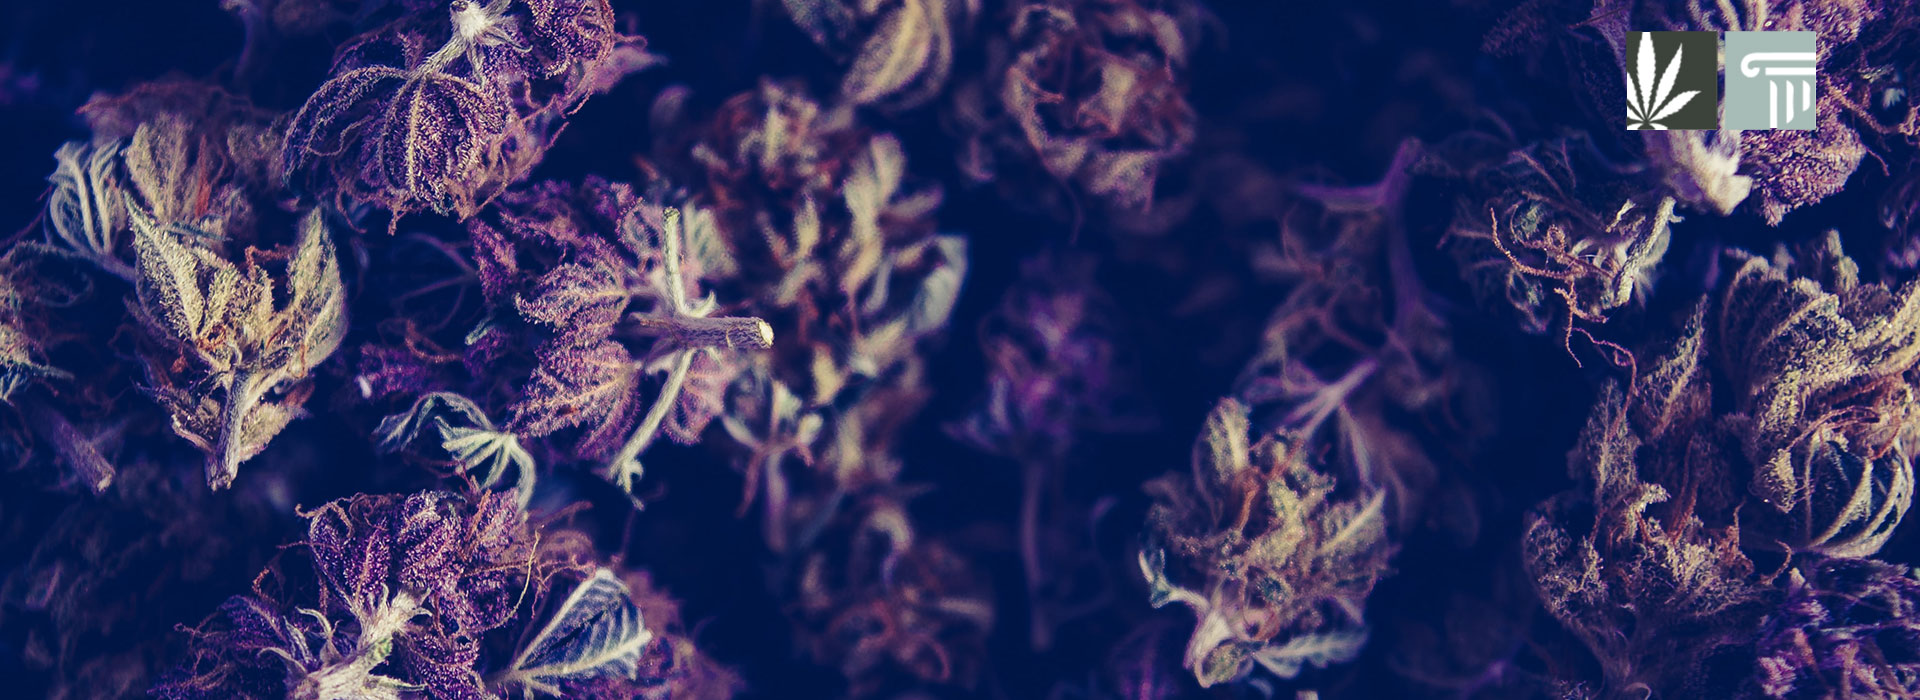 virginia marijuana possession decriminalized 1 pound